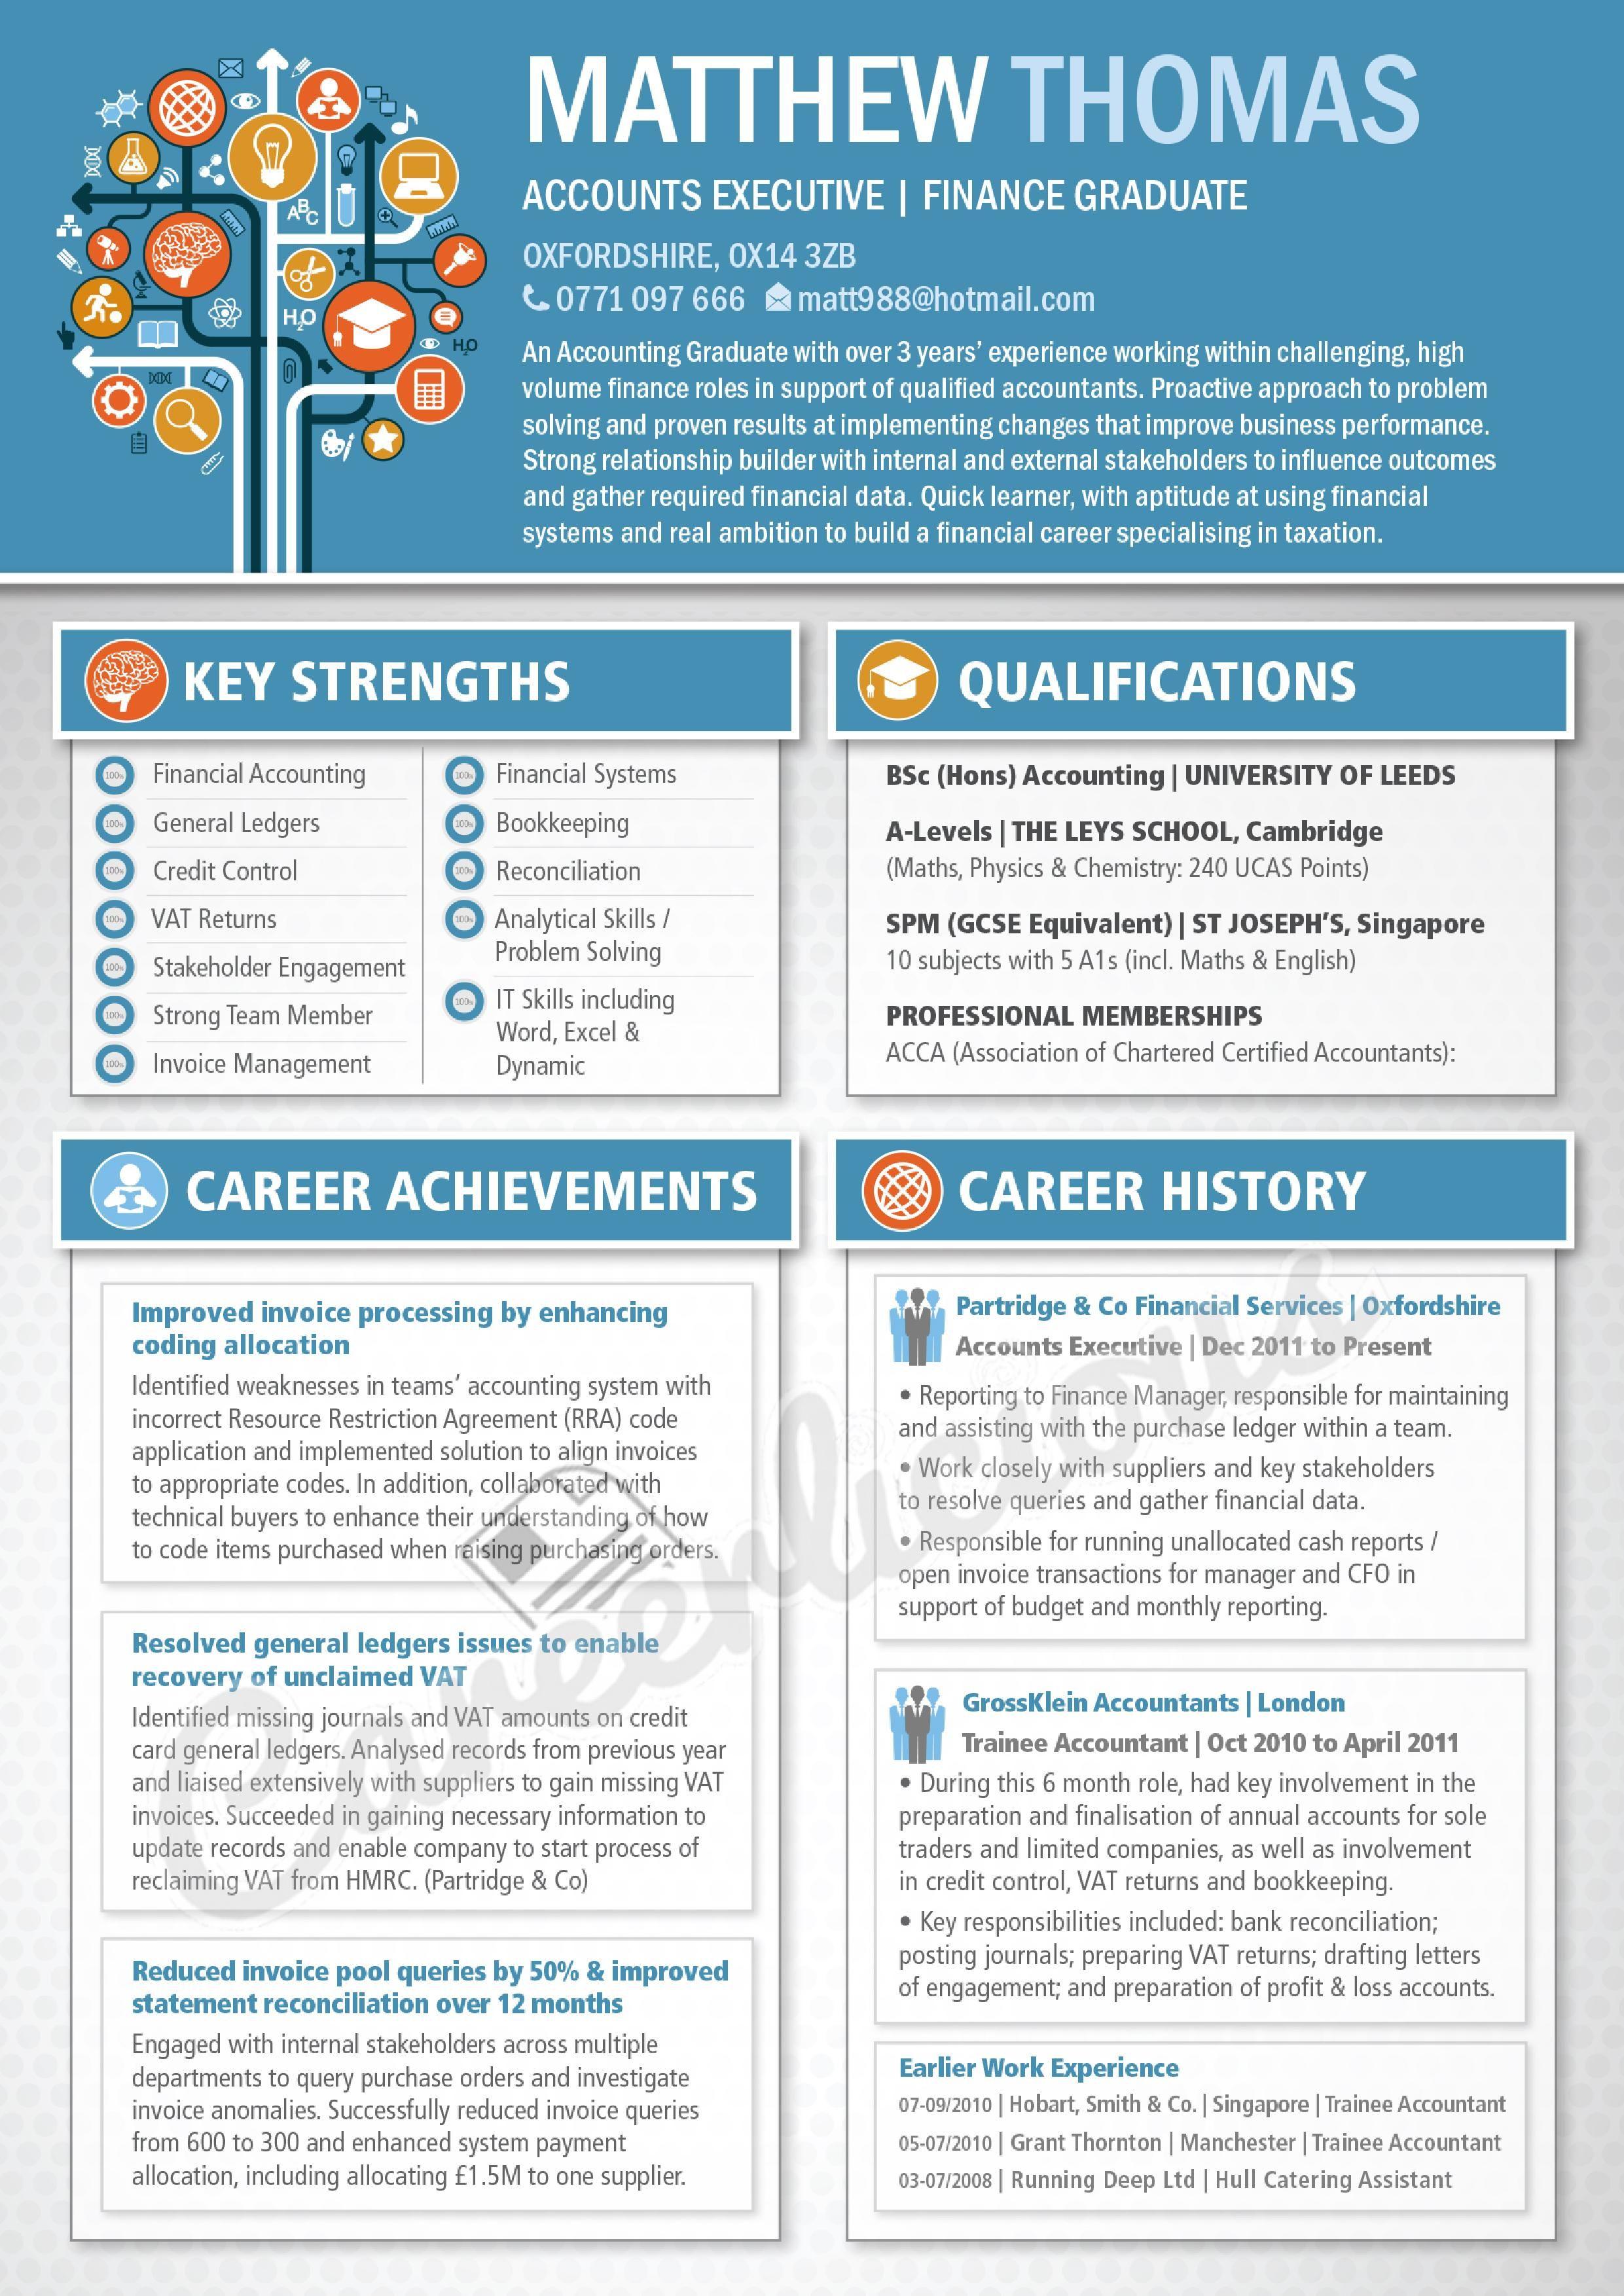 Sample Infographic CV | Infographic CVs | Pinterest | Infographic ...